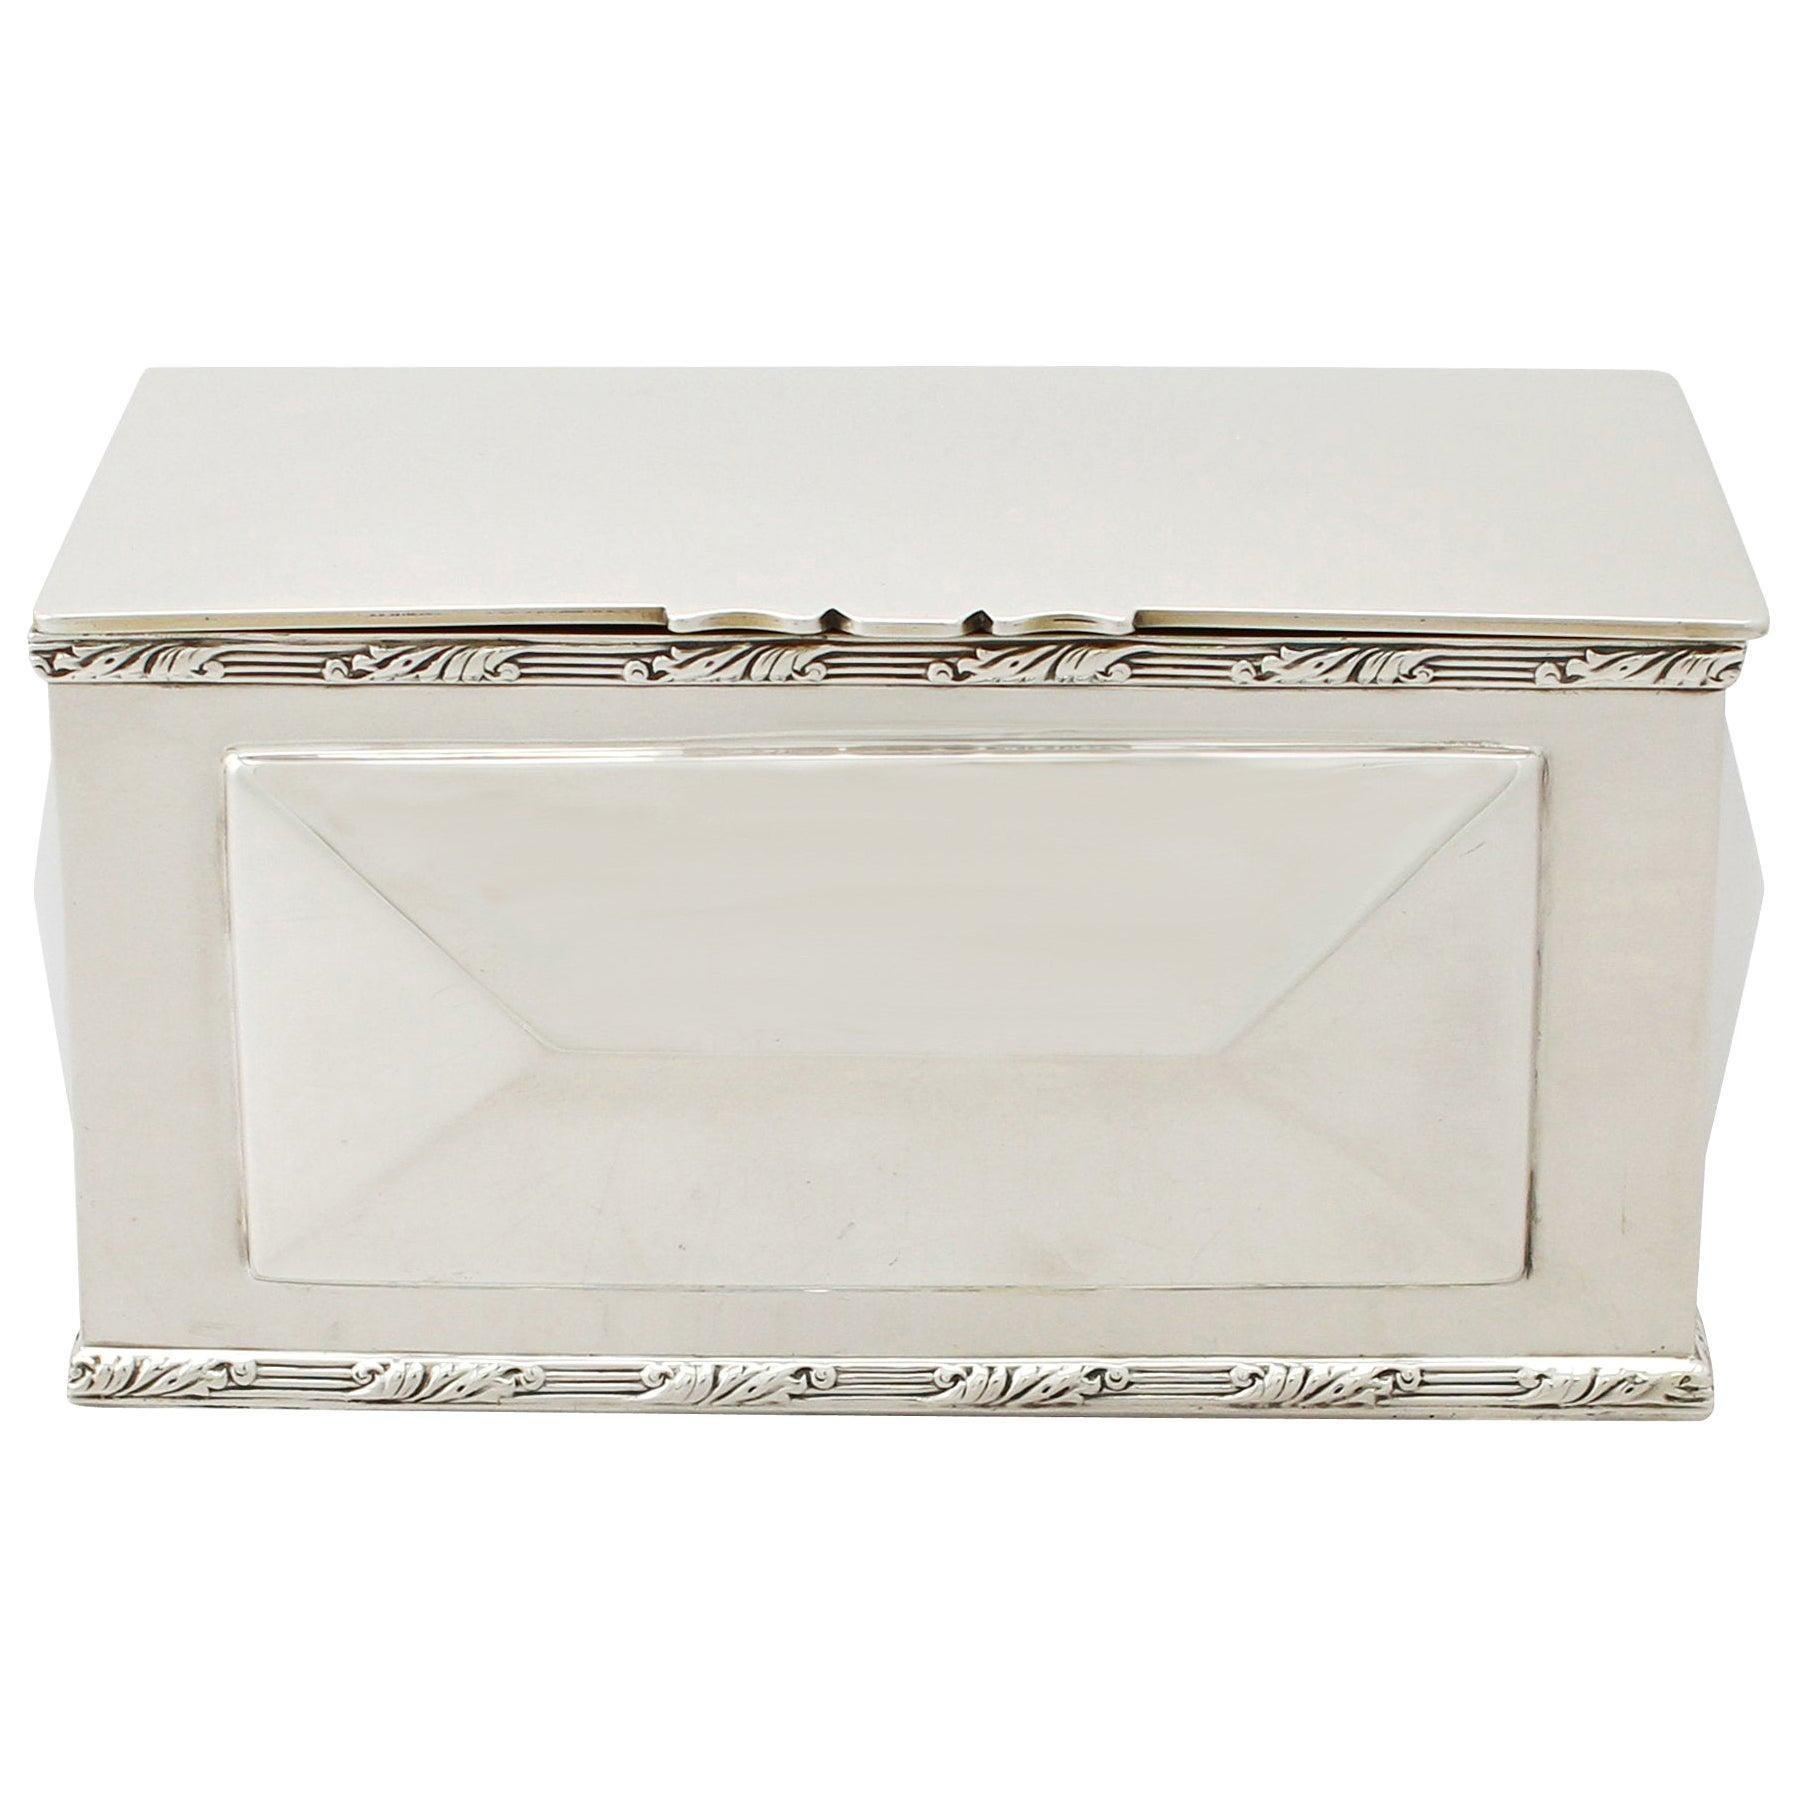 Edwardian English Sterling Silver Box